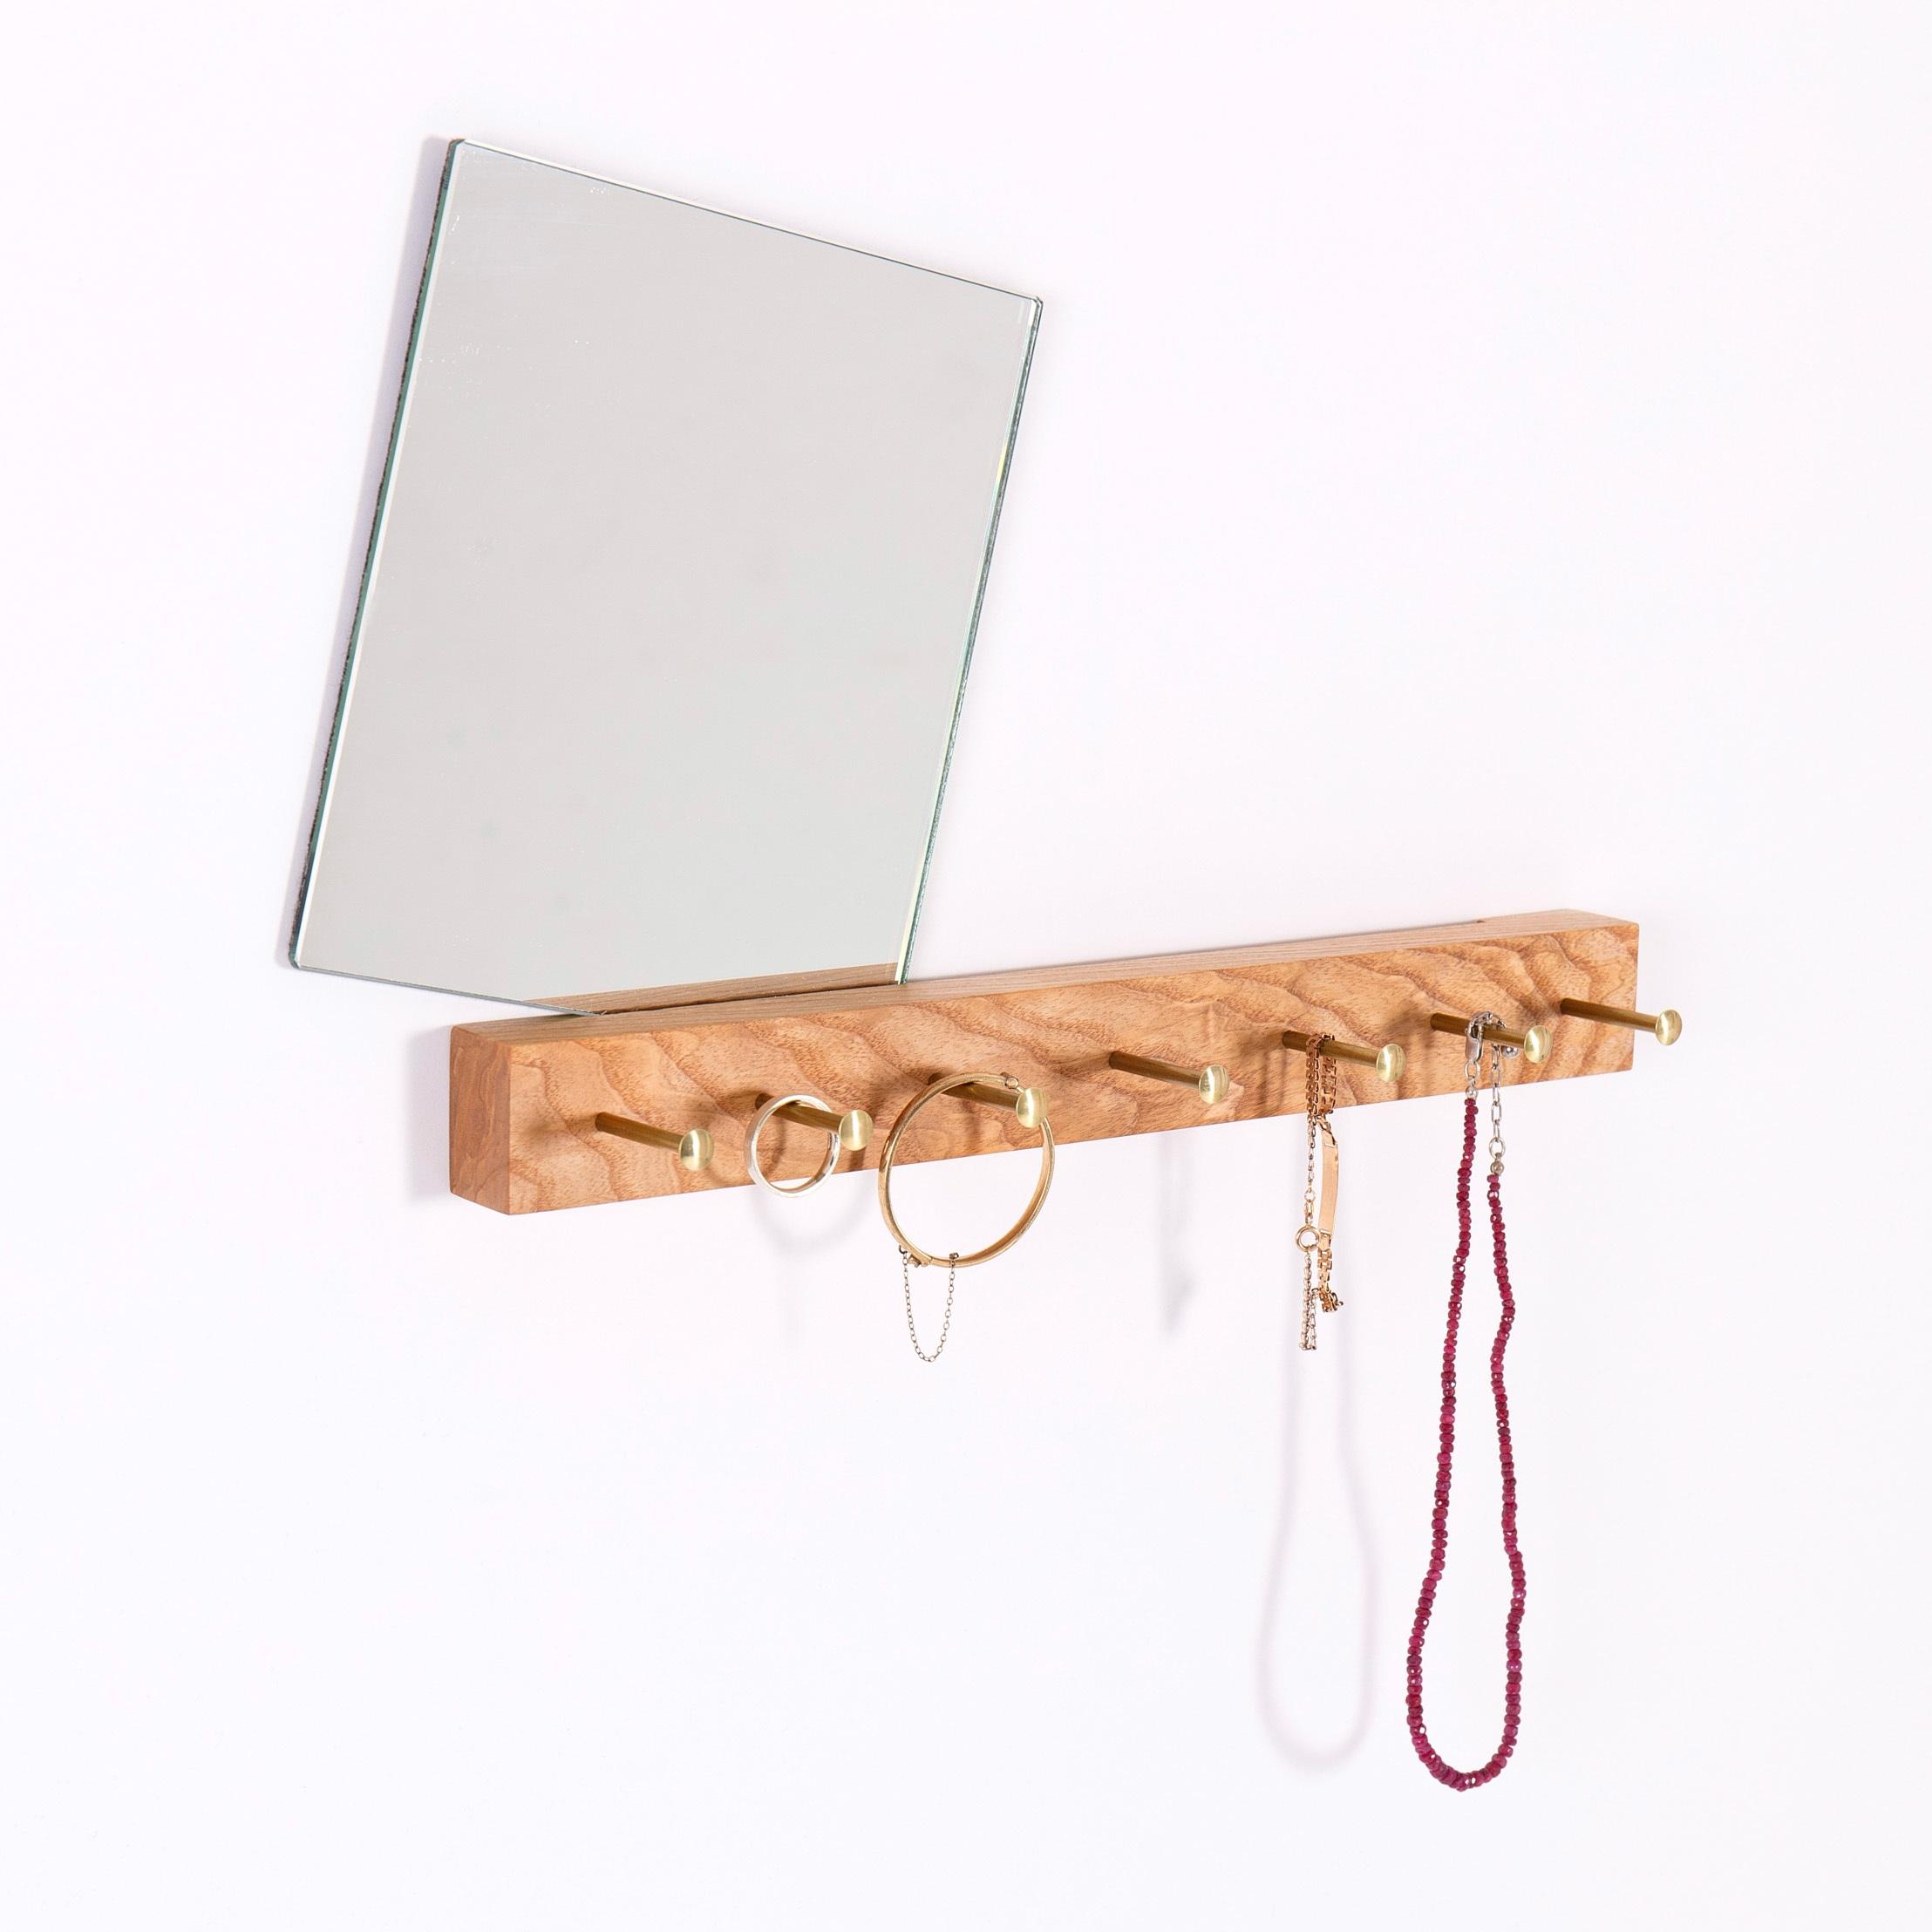 jewellery-hanger-rect_colinharris.jpg